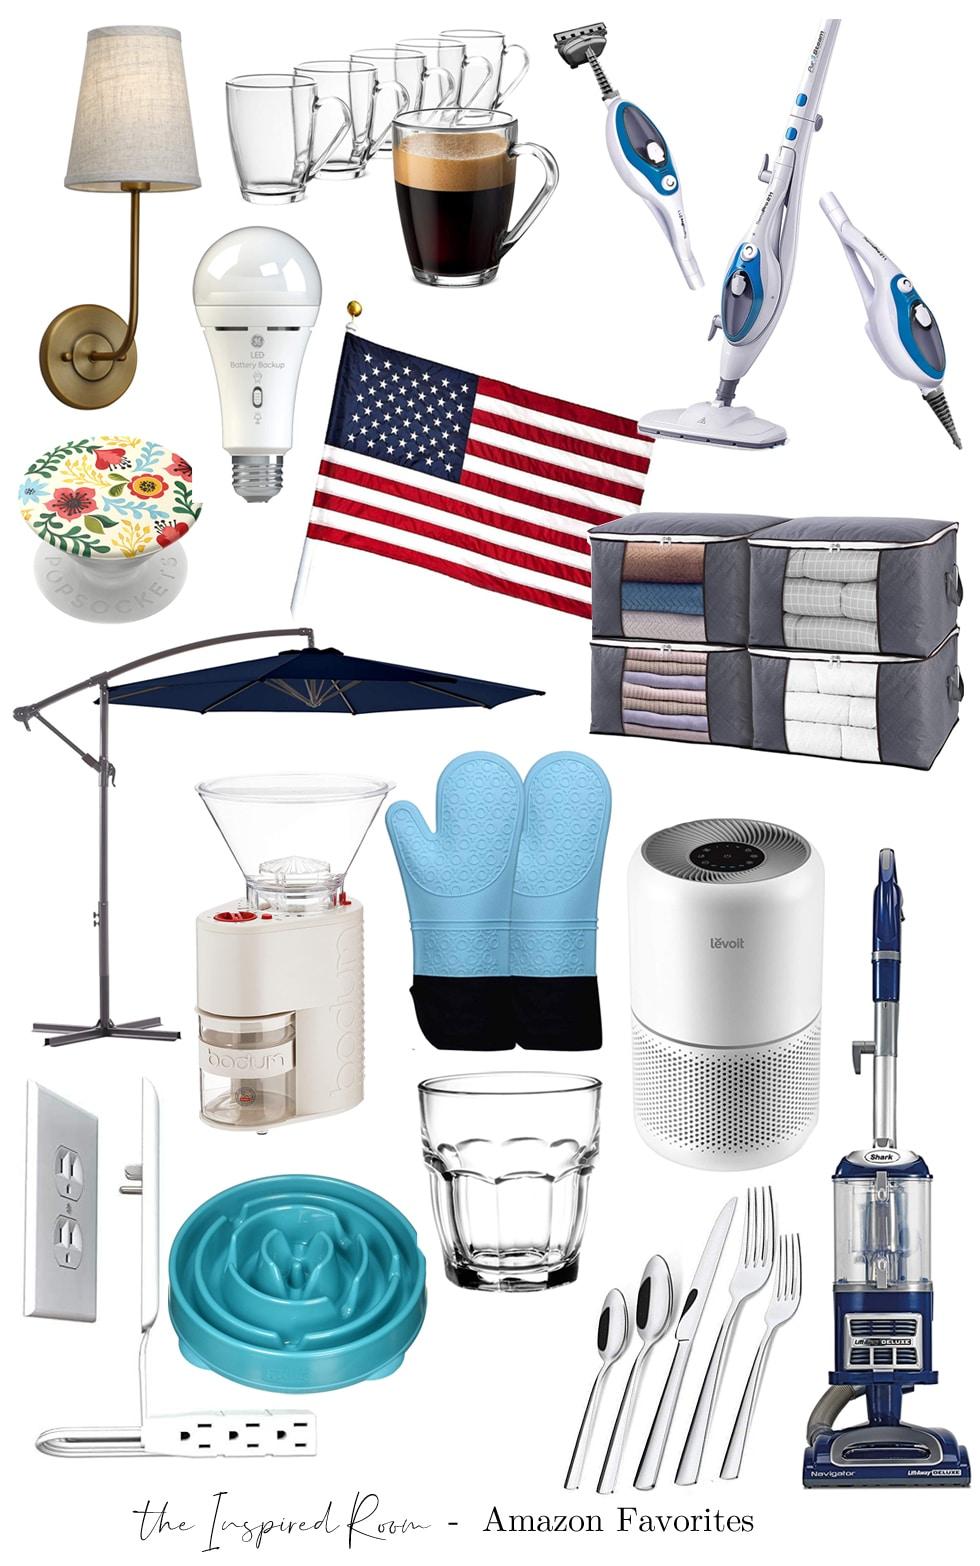 Favorite Amazon Home Decor + Household Gadgets